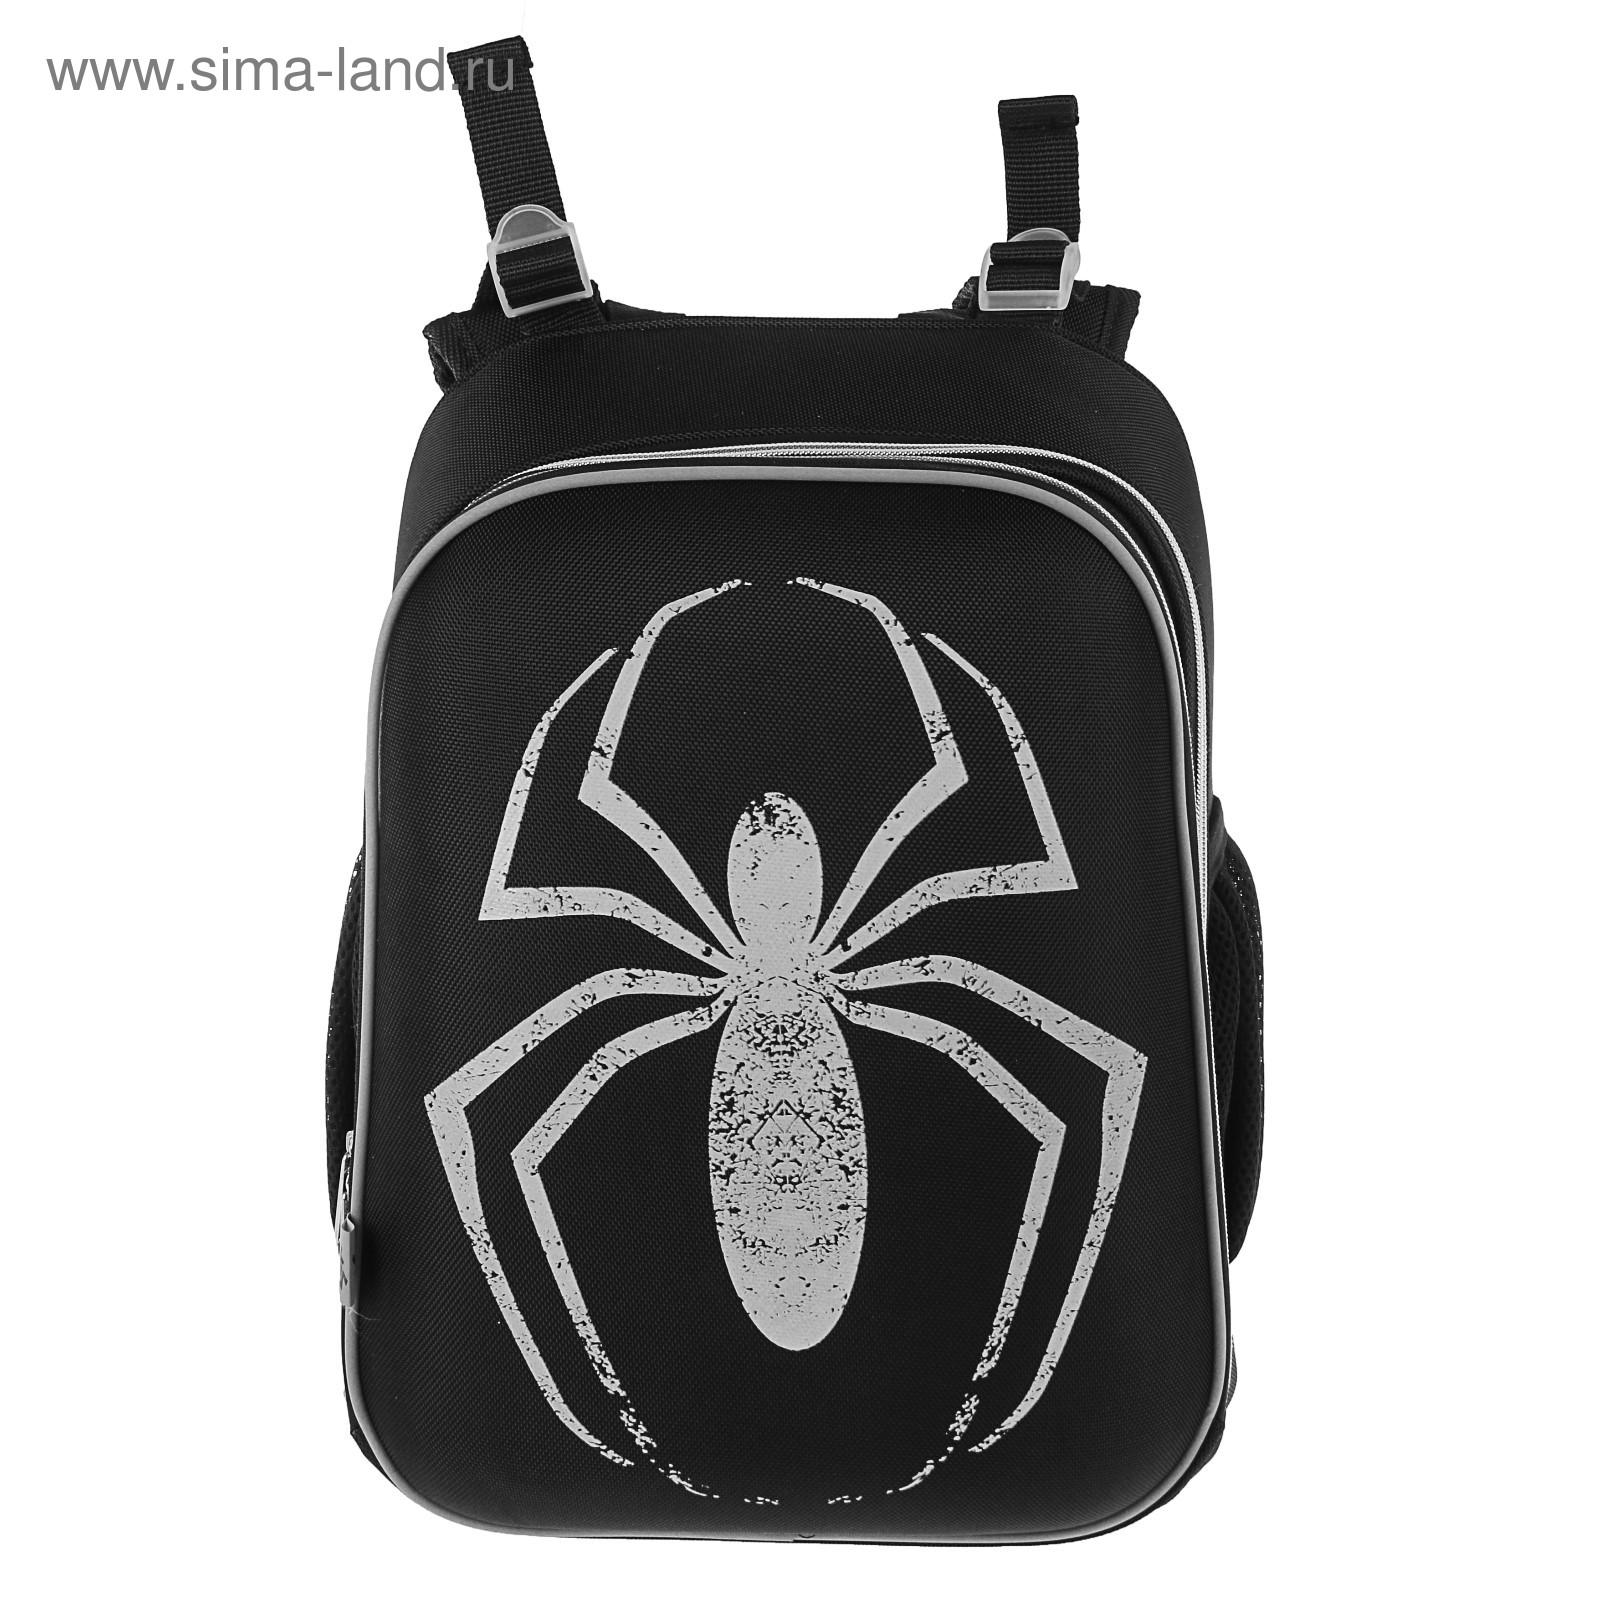 03a8253dd58f Рюкзак каркасный YES H-12 38*29*15 для мальчика Spider, чёрный/серый ...